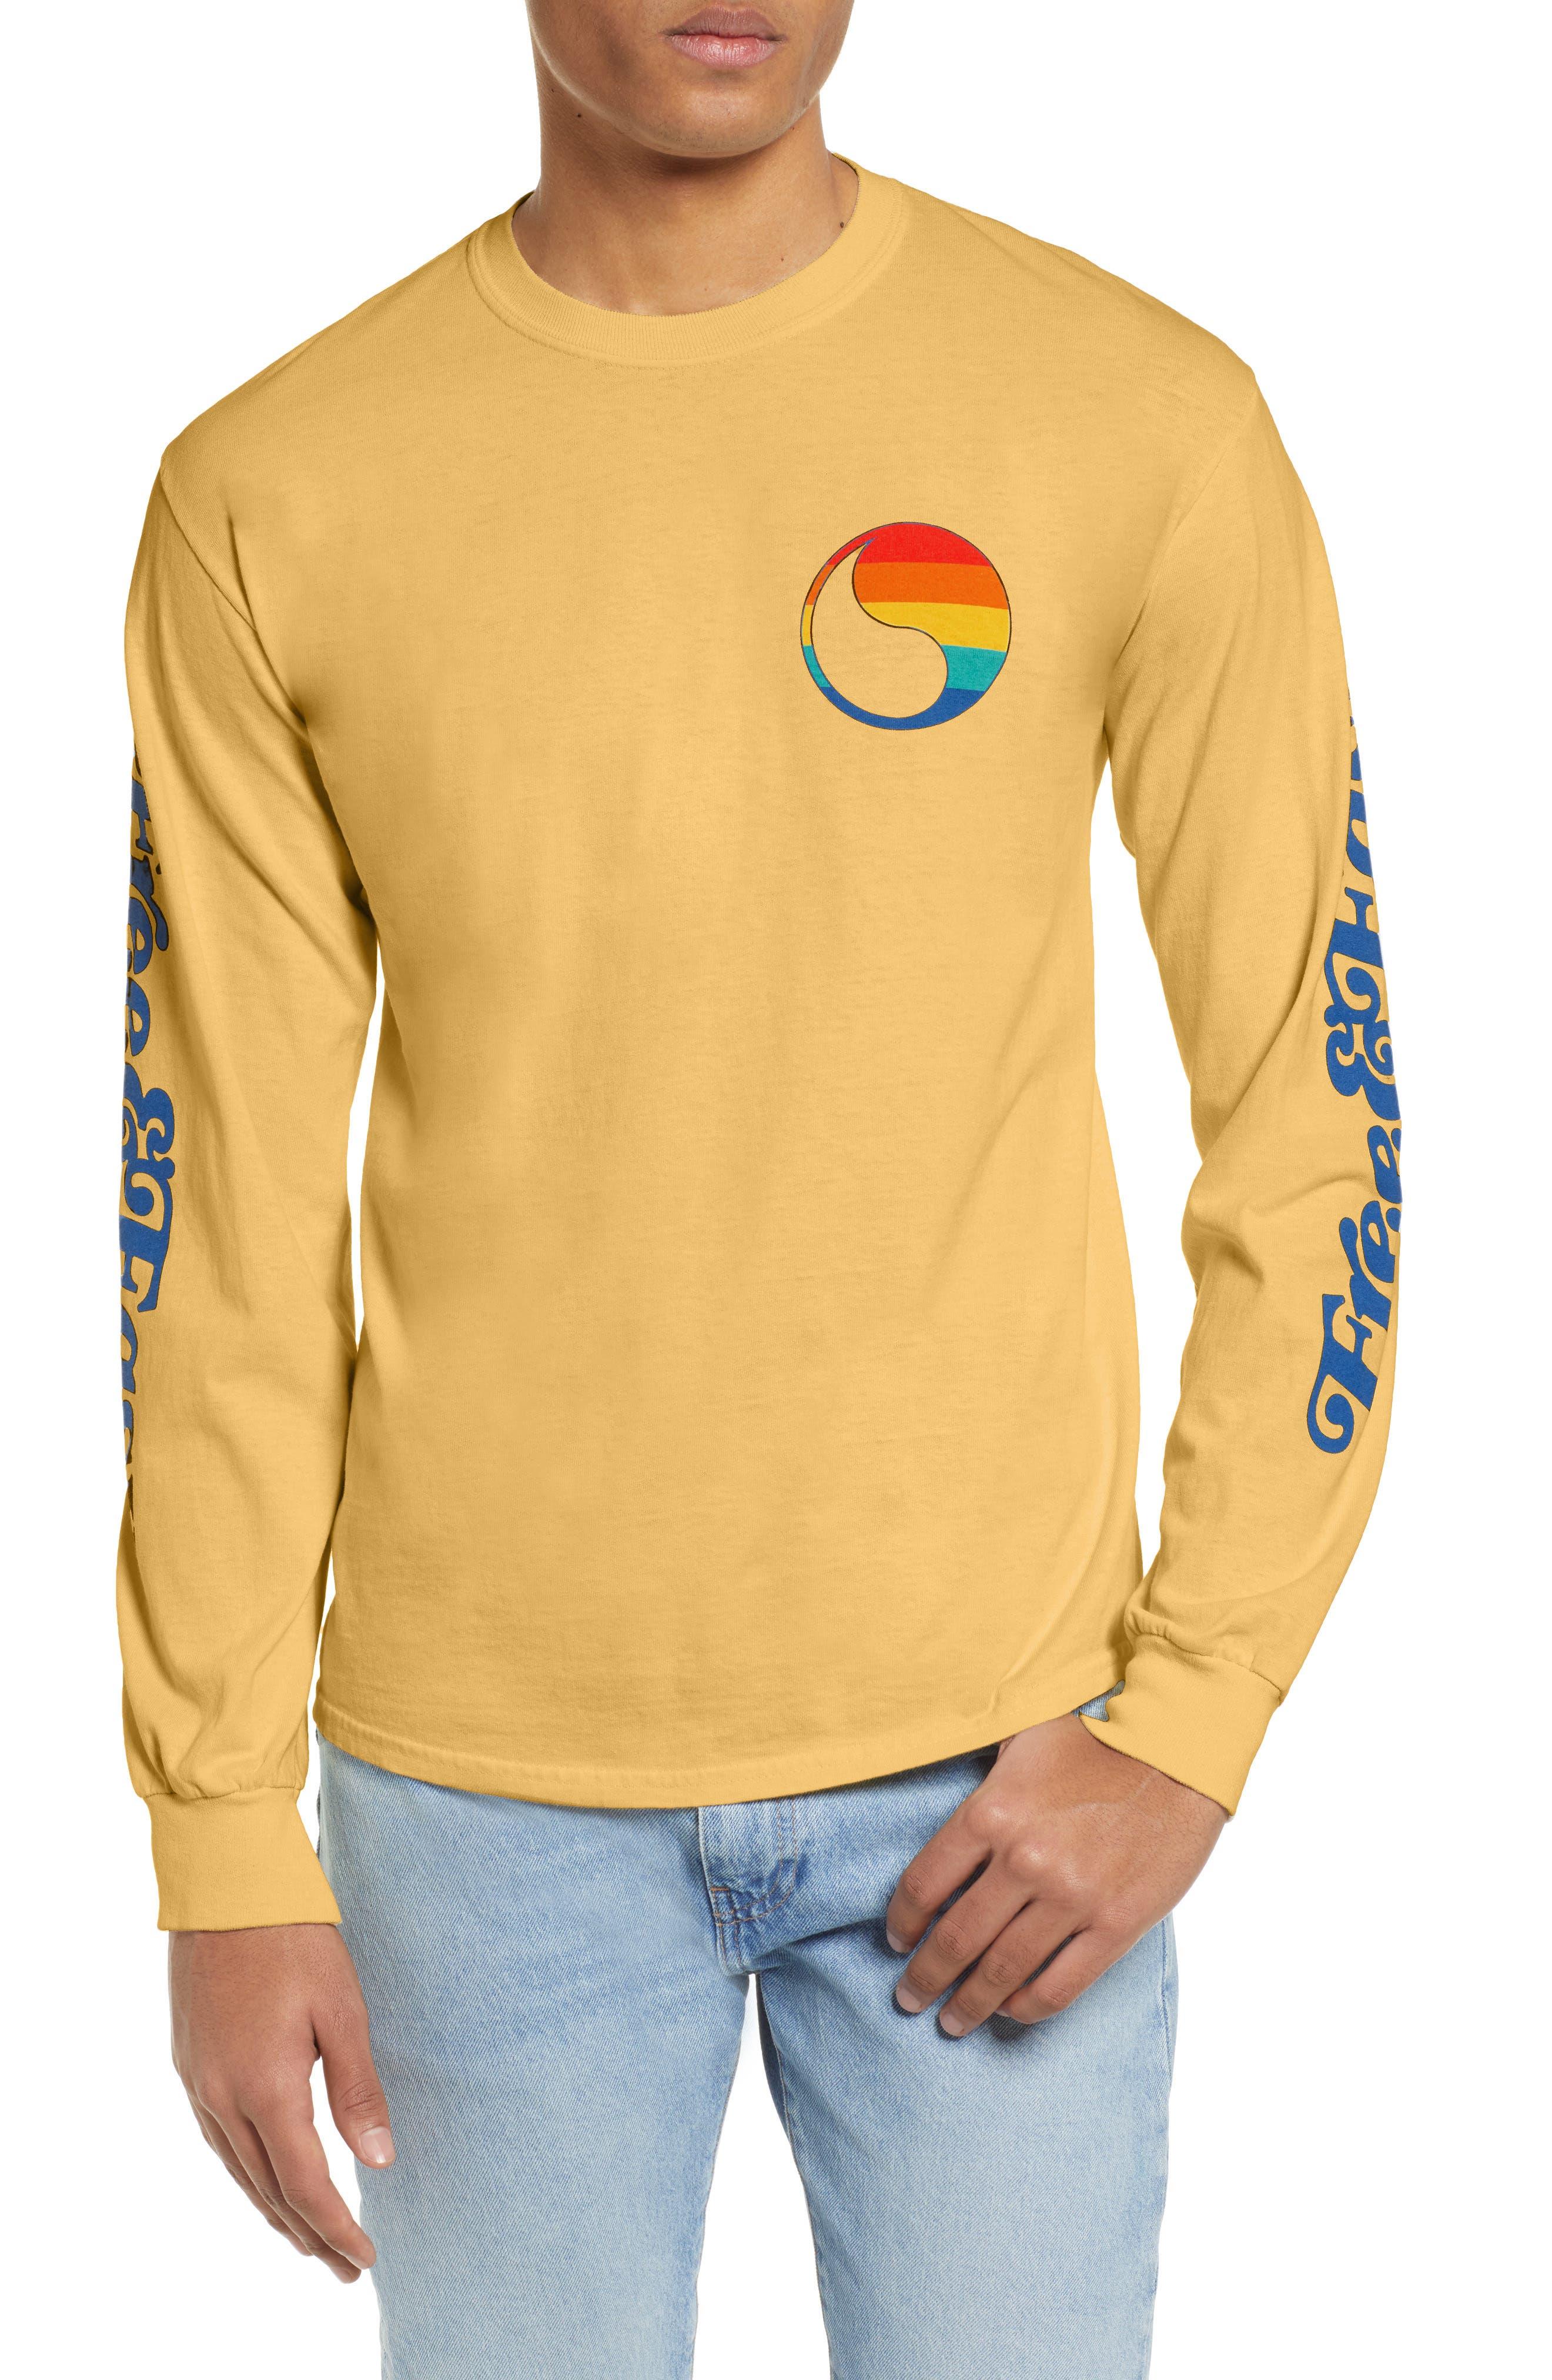 Free & Easy Rainbow Yin Yang Long Sleeve T-Shirt, Main, color, YELLOW